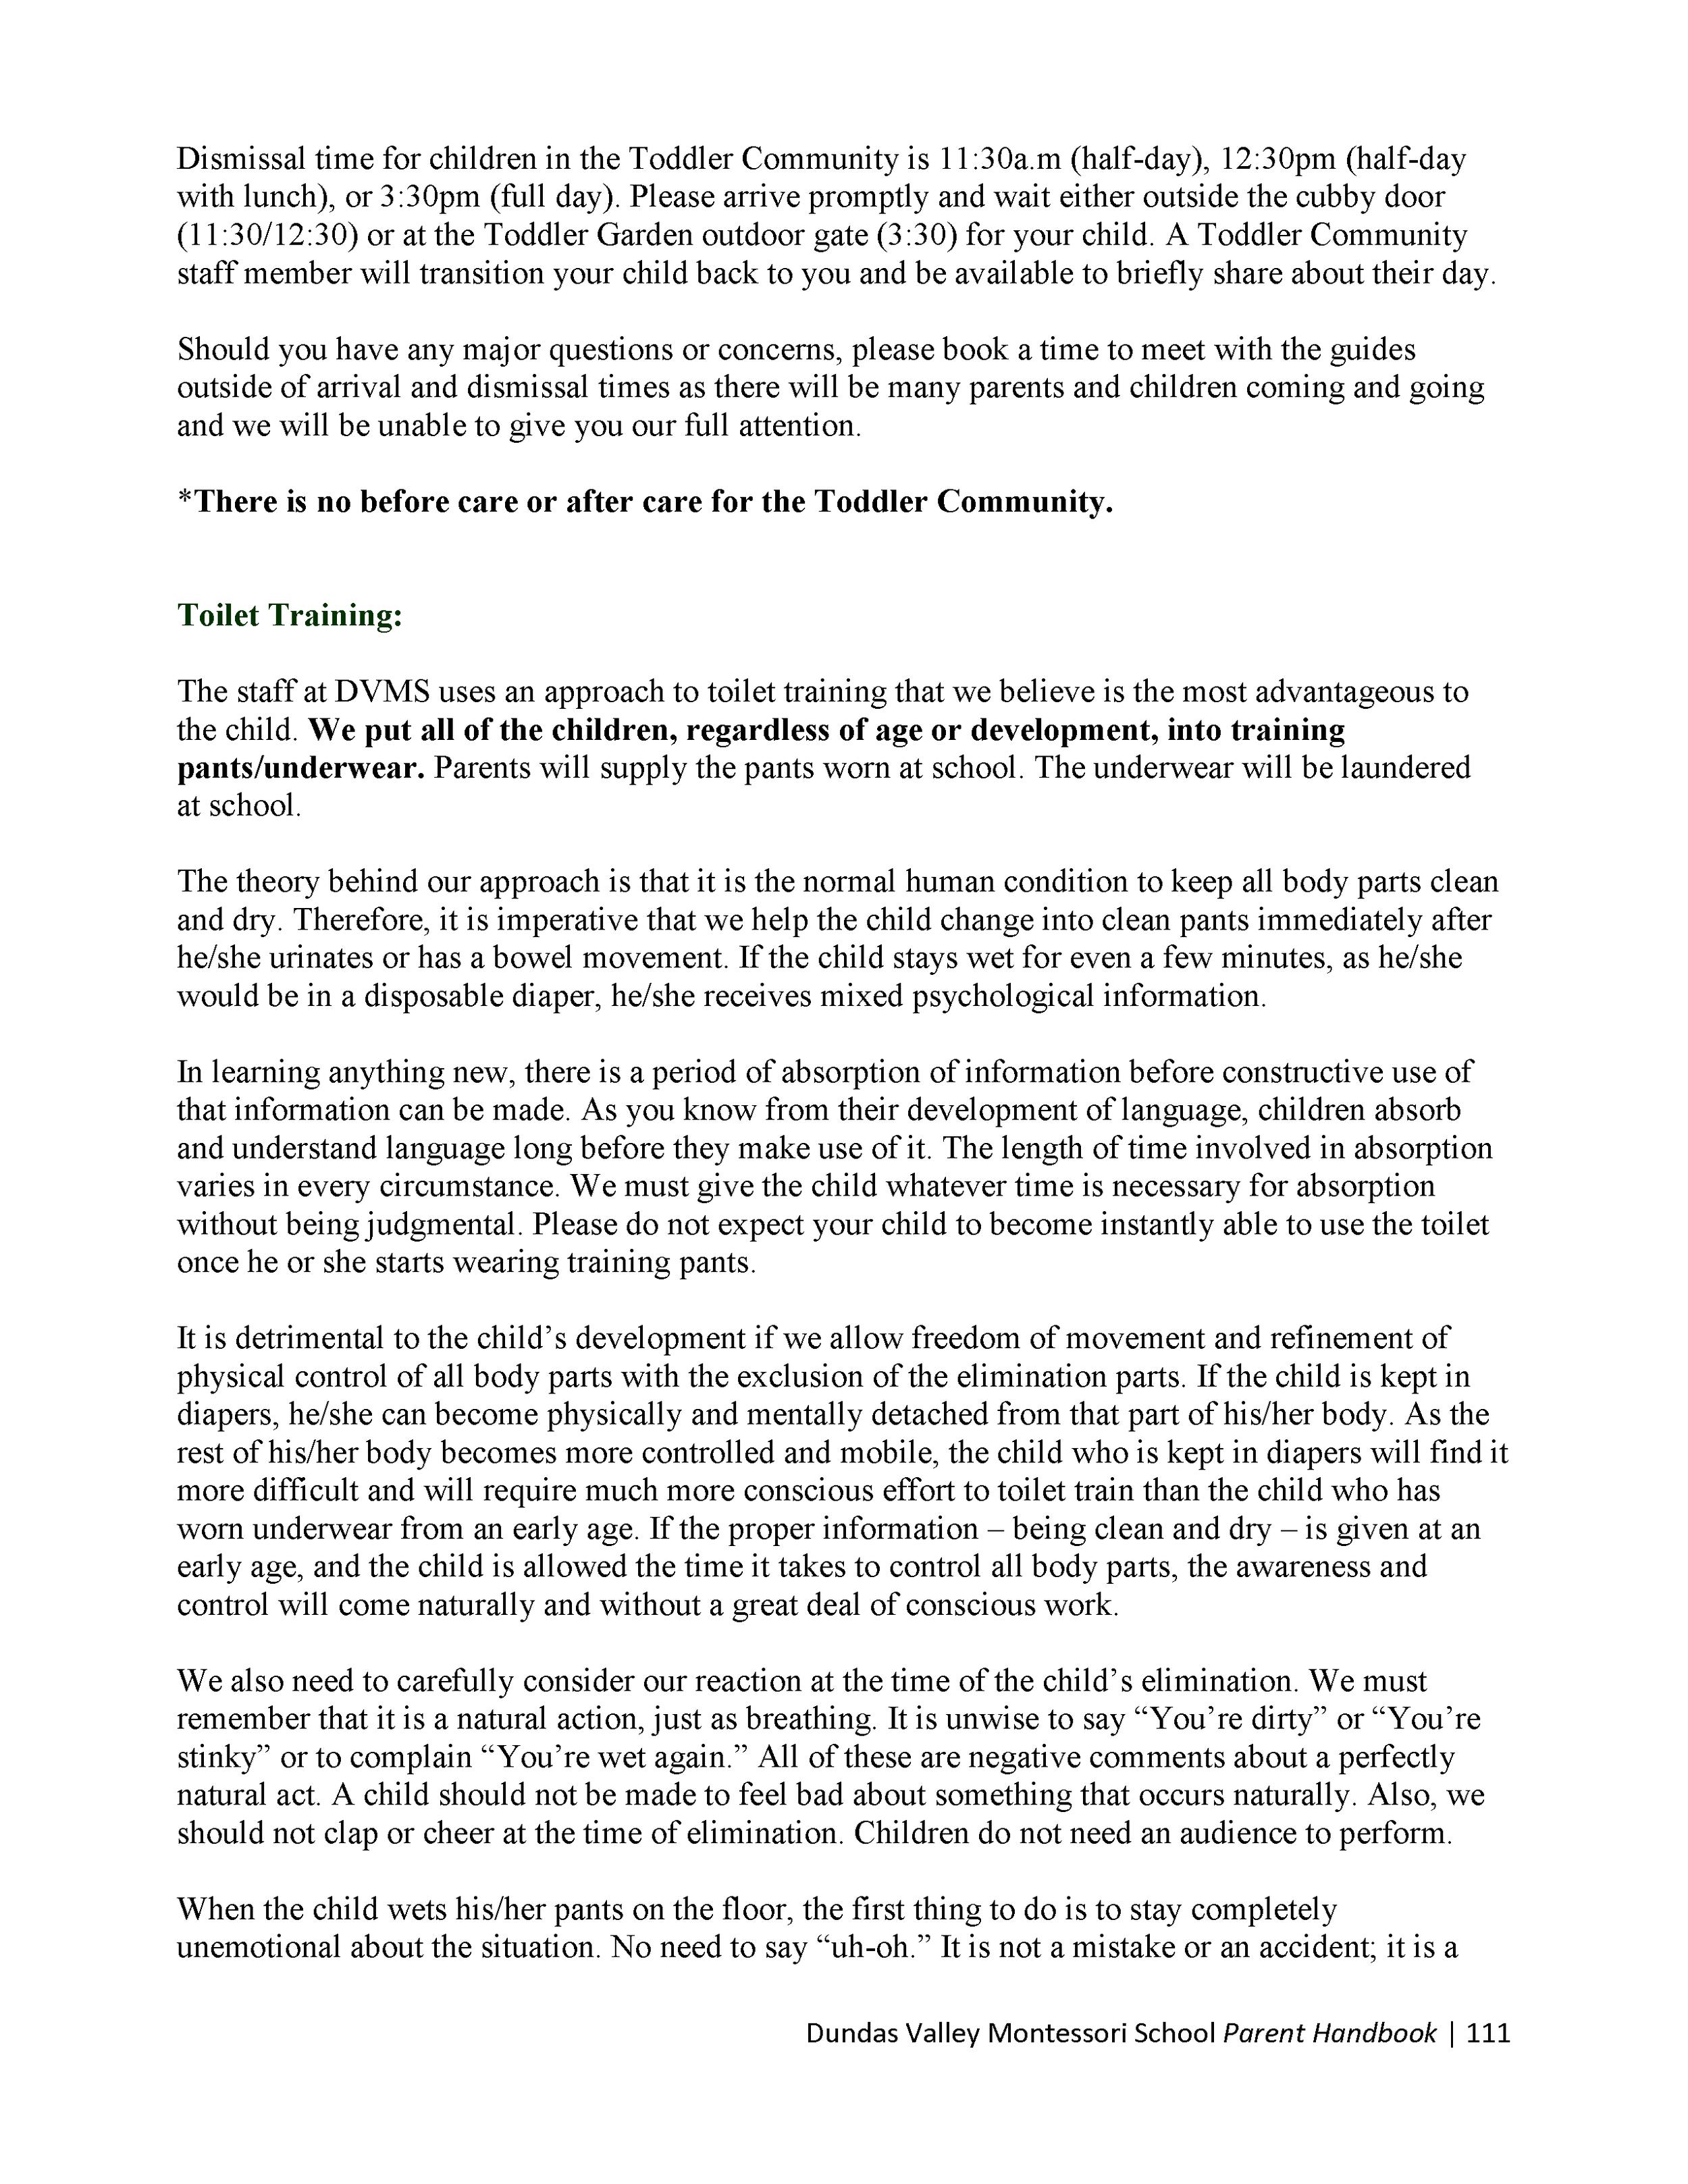 DVMS-Parent-Handbook-19-20_Page_113.png